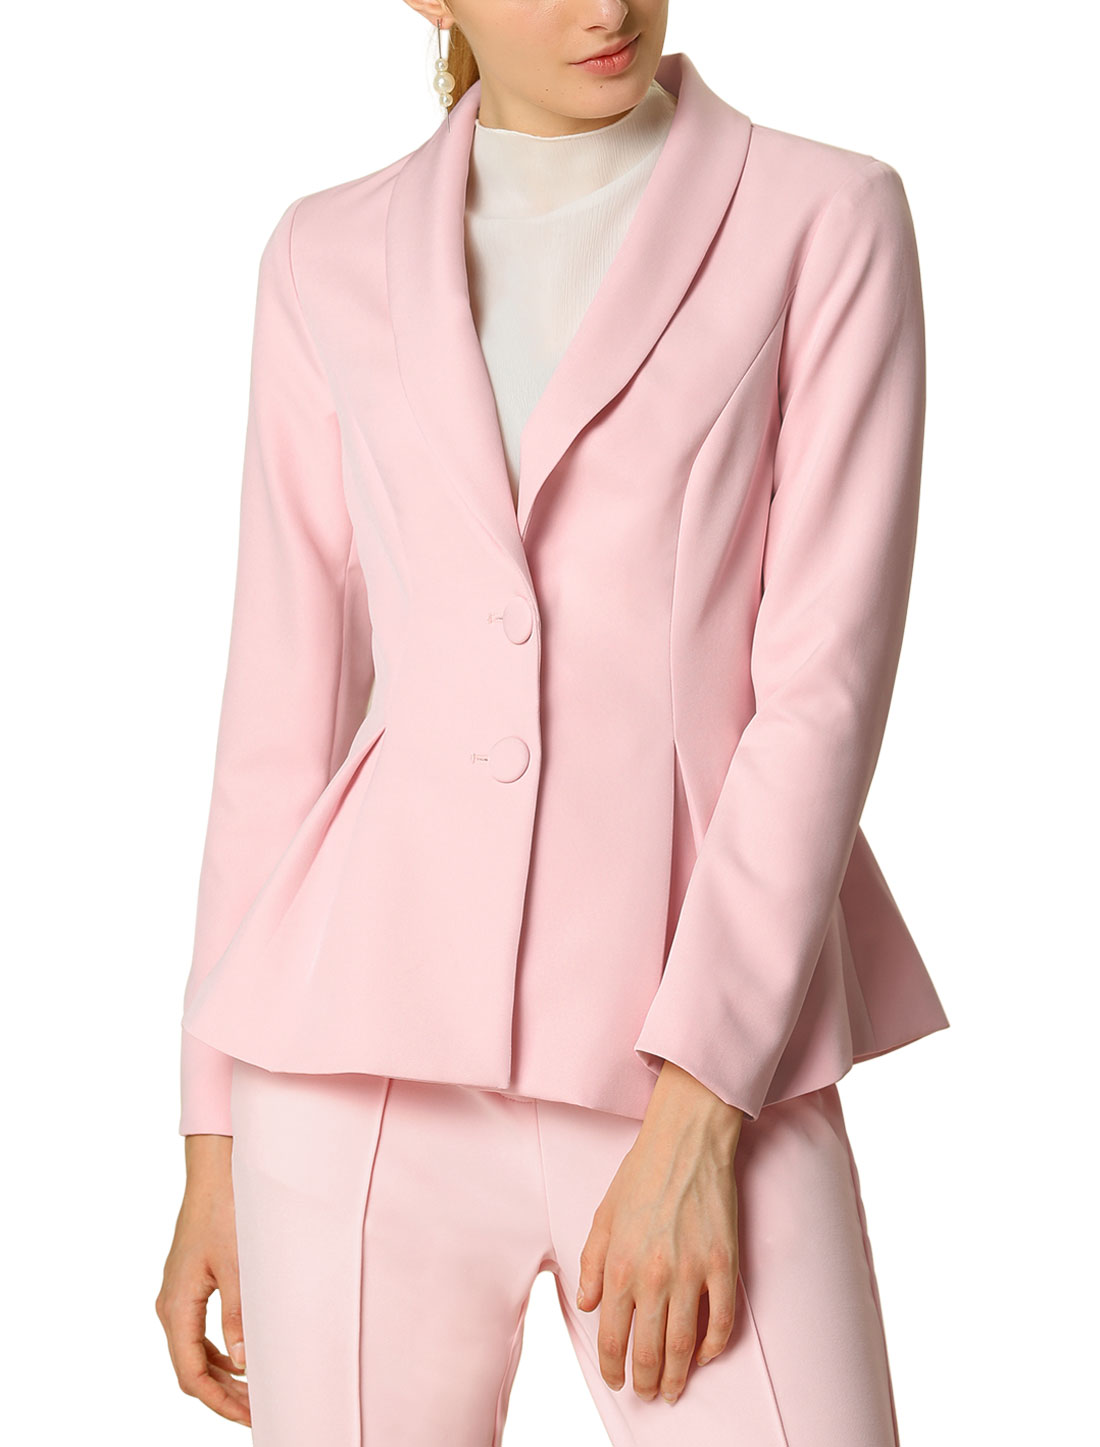 Women's Casual Lapel Collar Elegant Button Work Office Blazer Pink S (US 6)